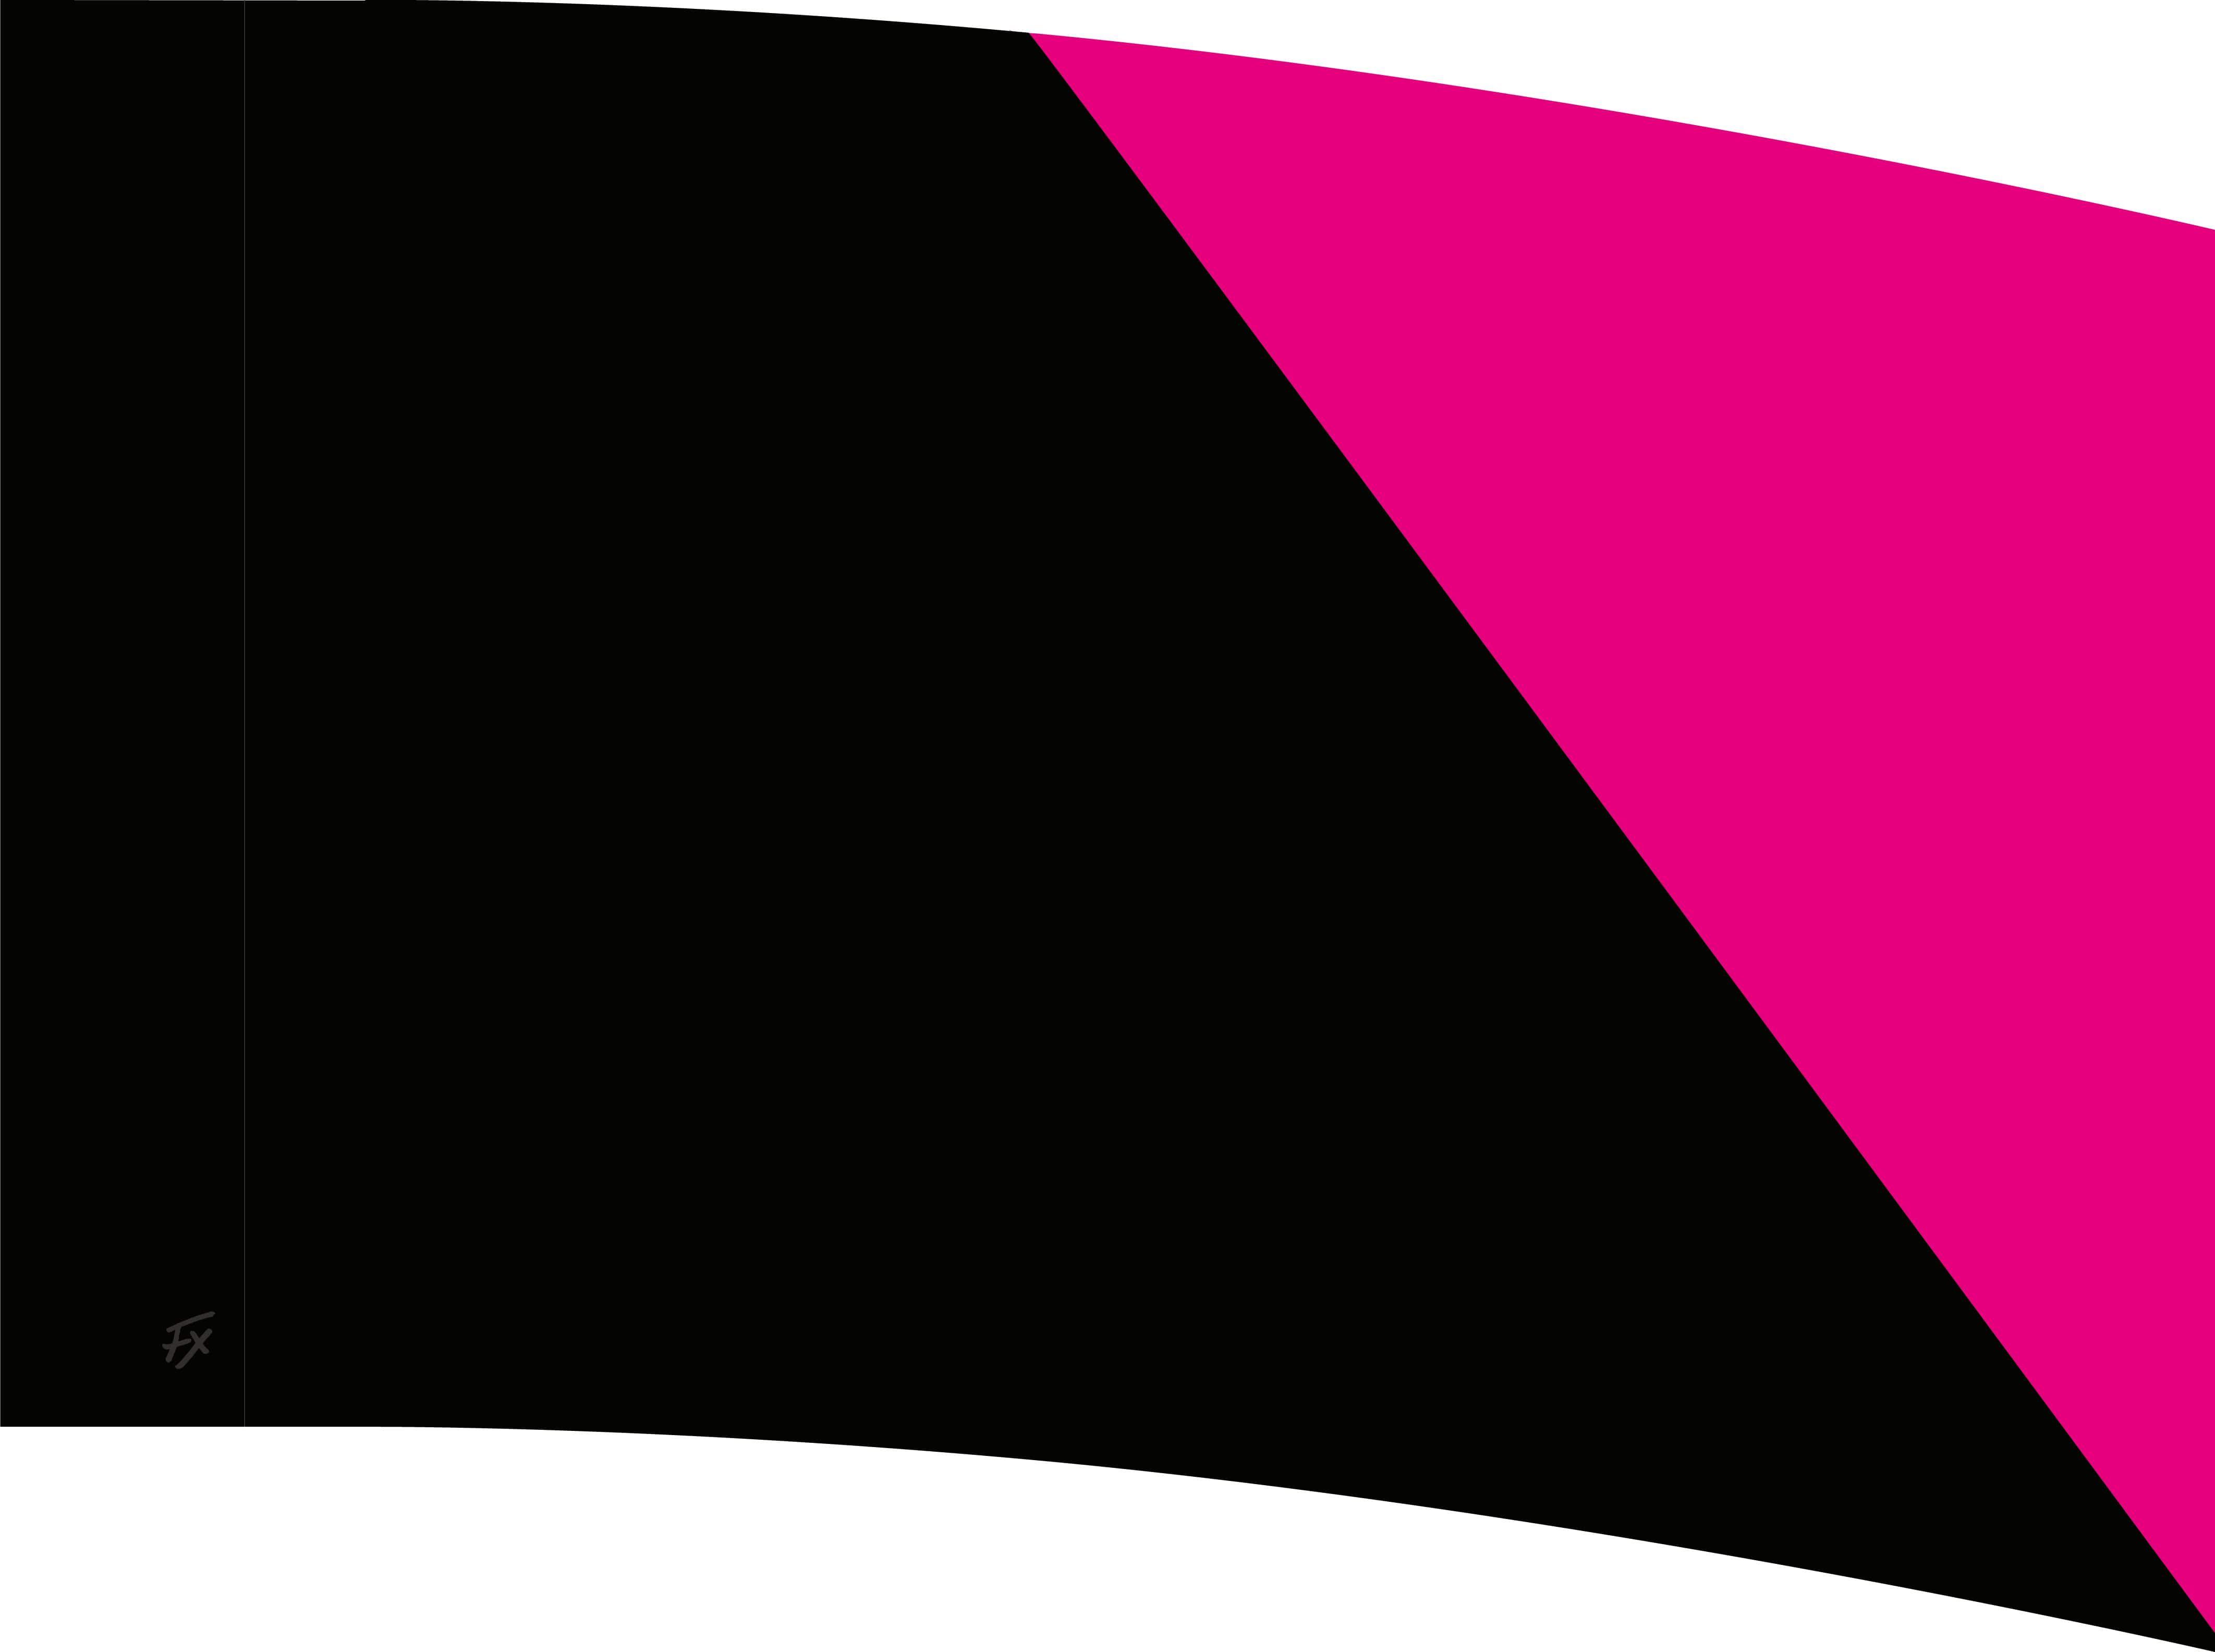 Standard Curve Diagonal